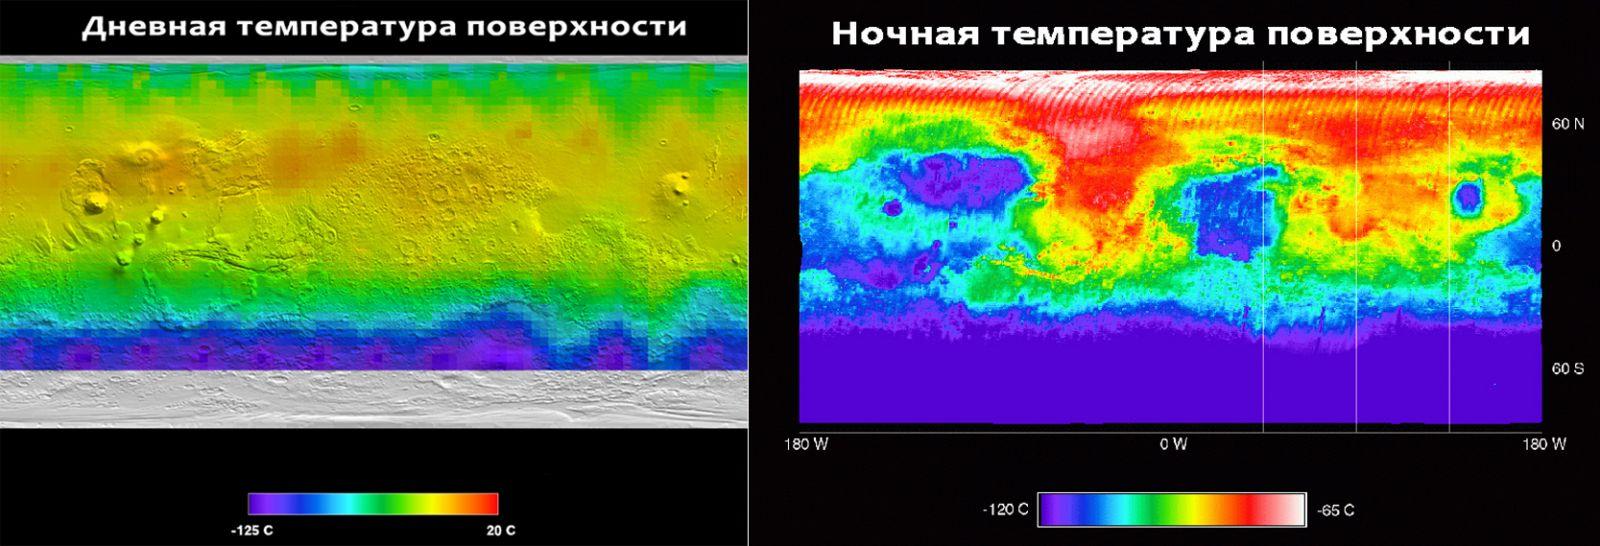 Дневная и ночная температура на Марсе